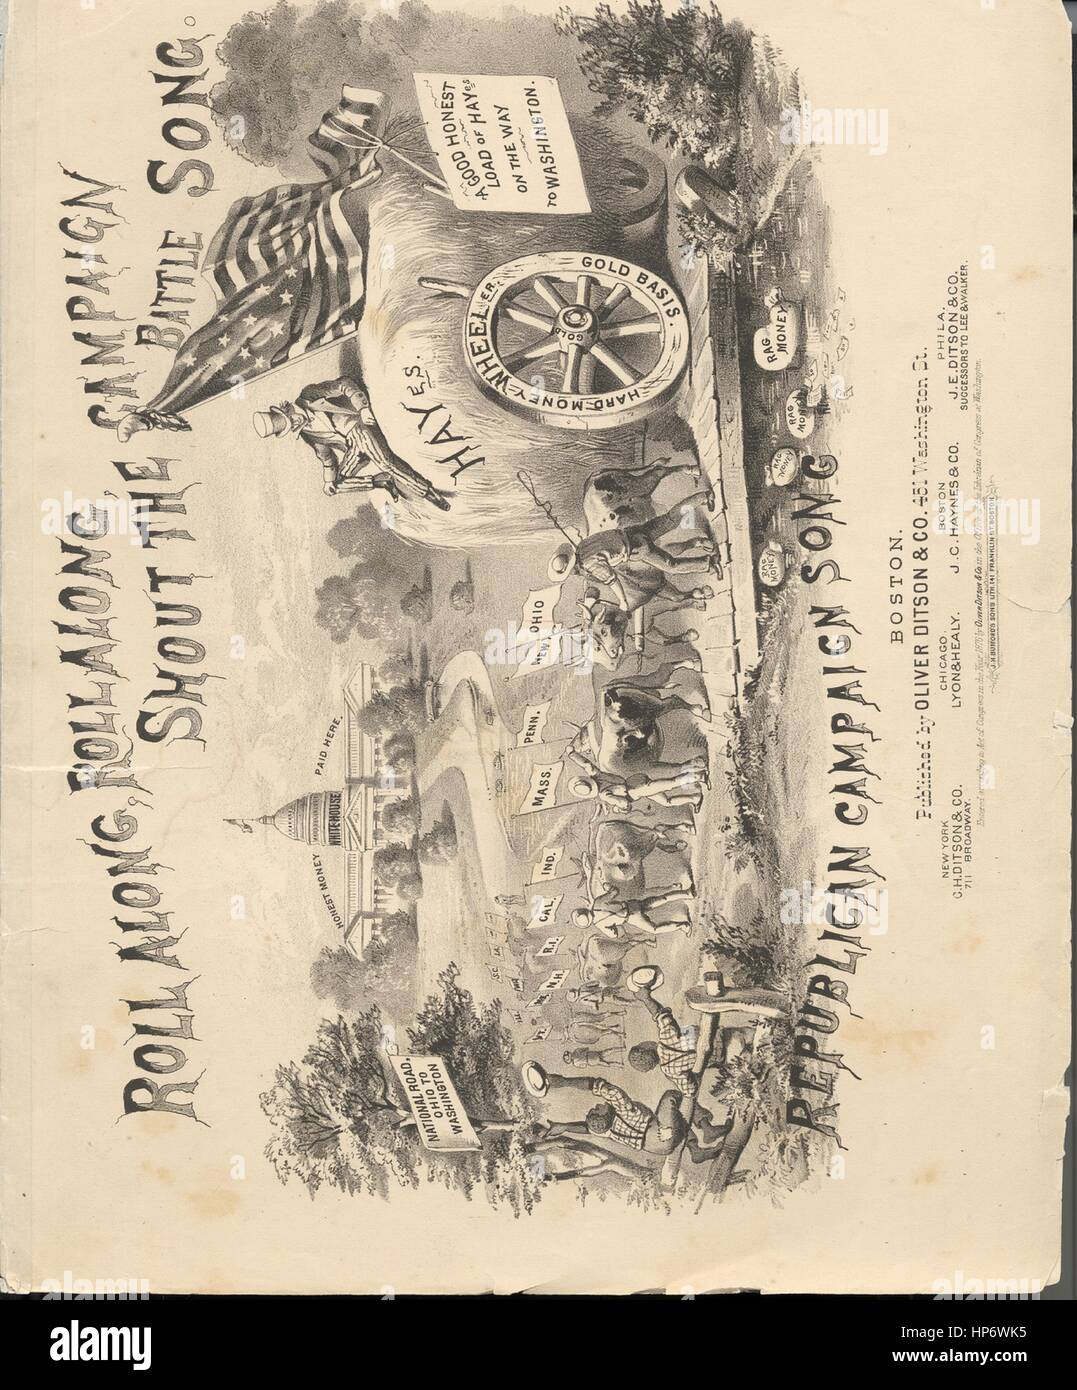 1876 Boston Stockfotos & 1876 Boston Bilder - Alamy